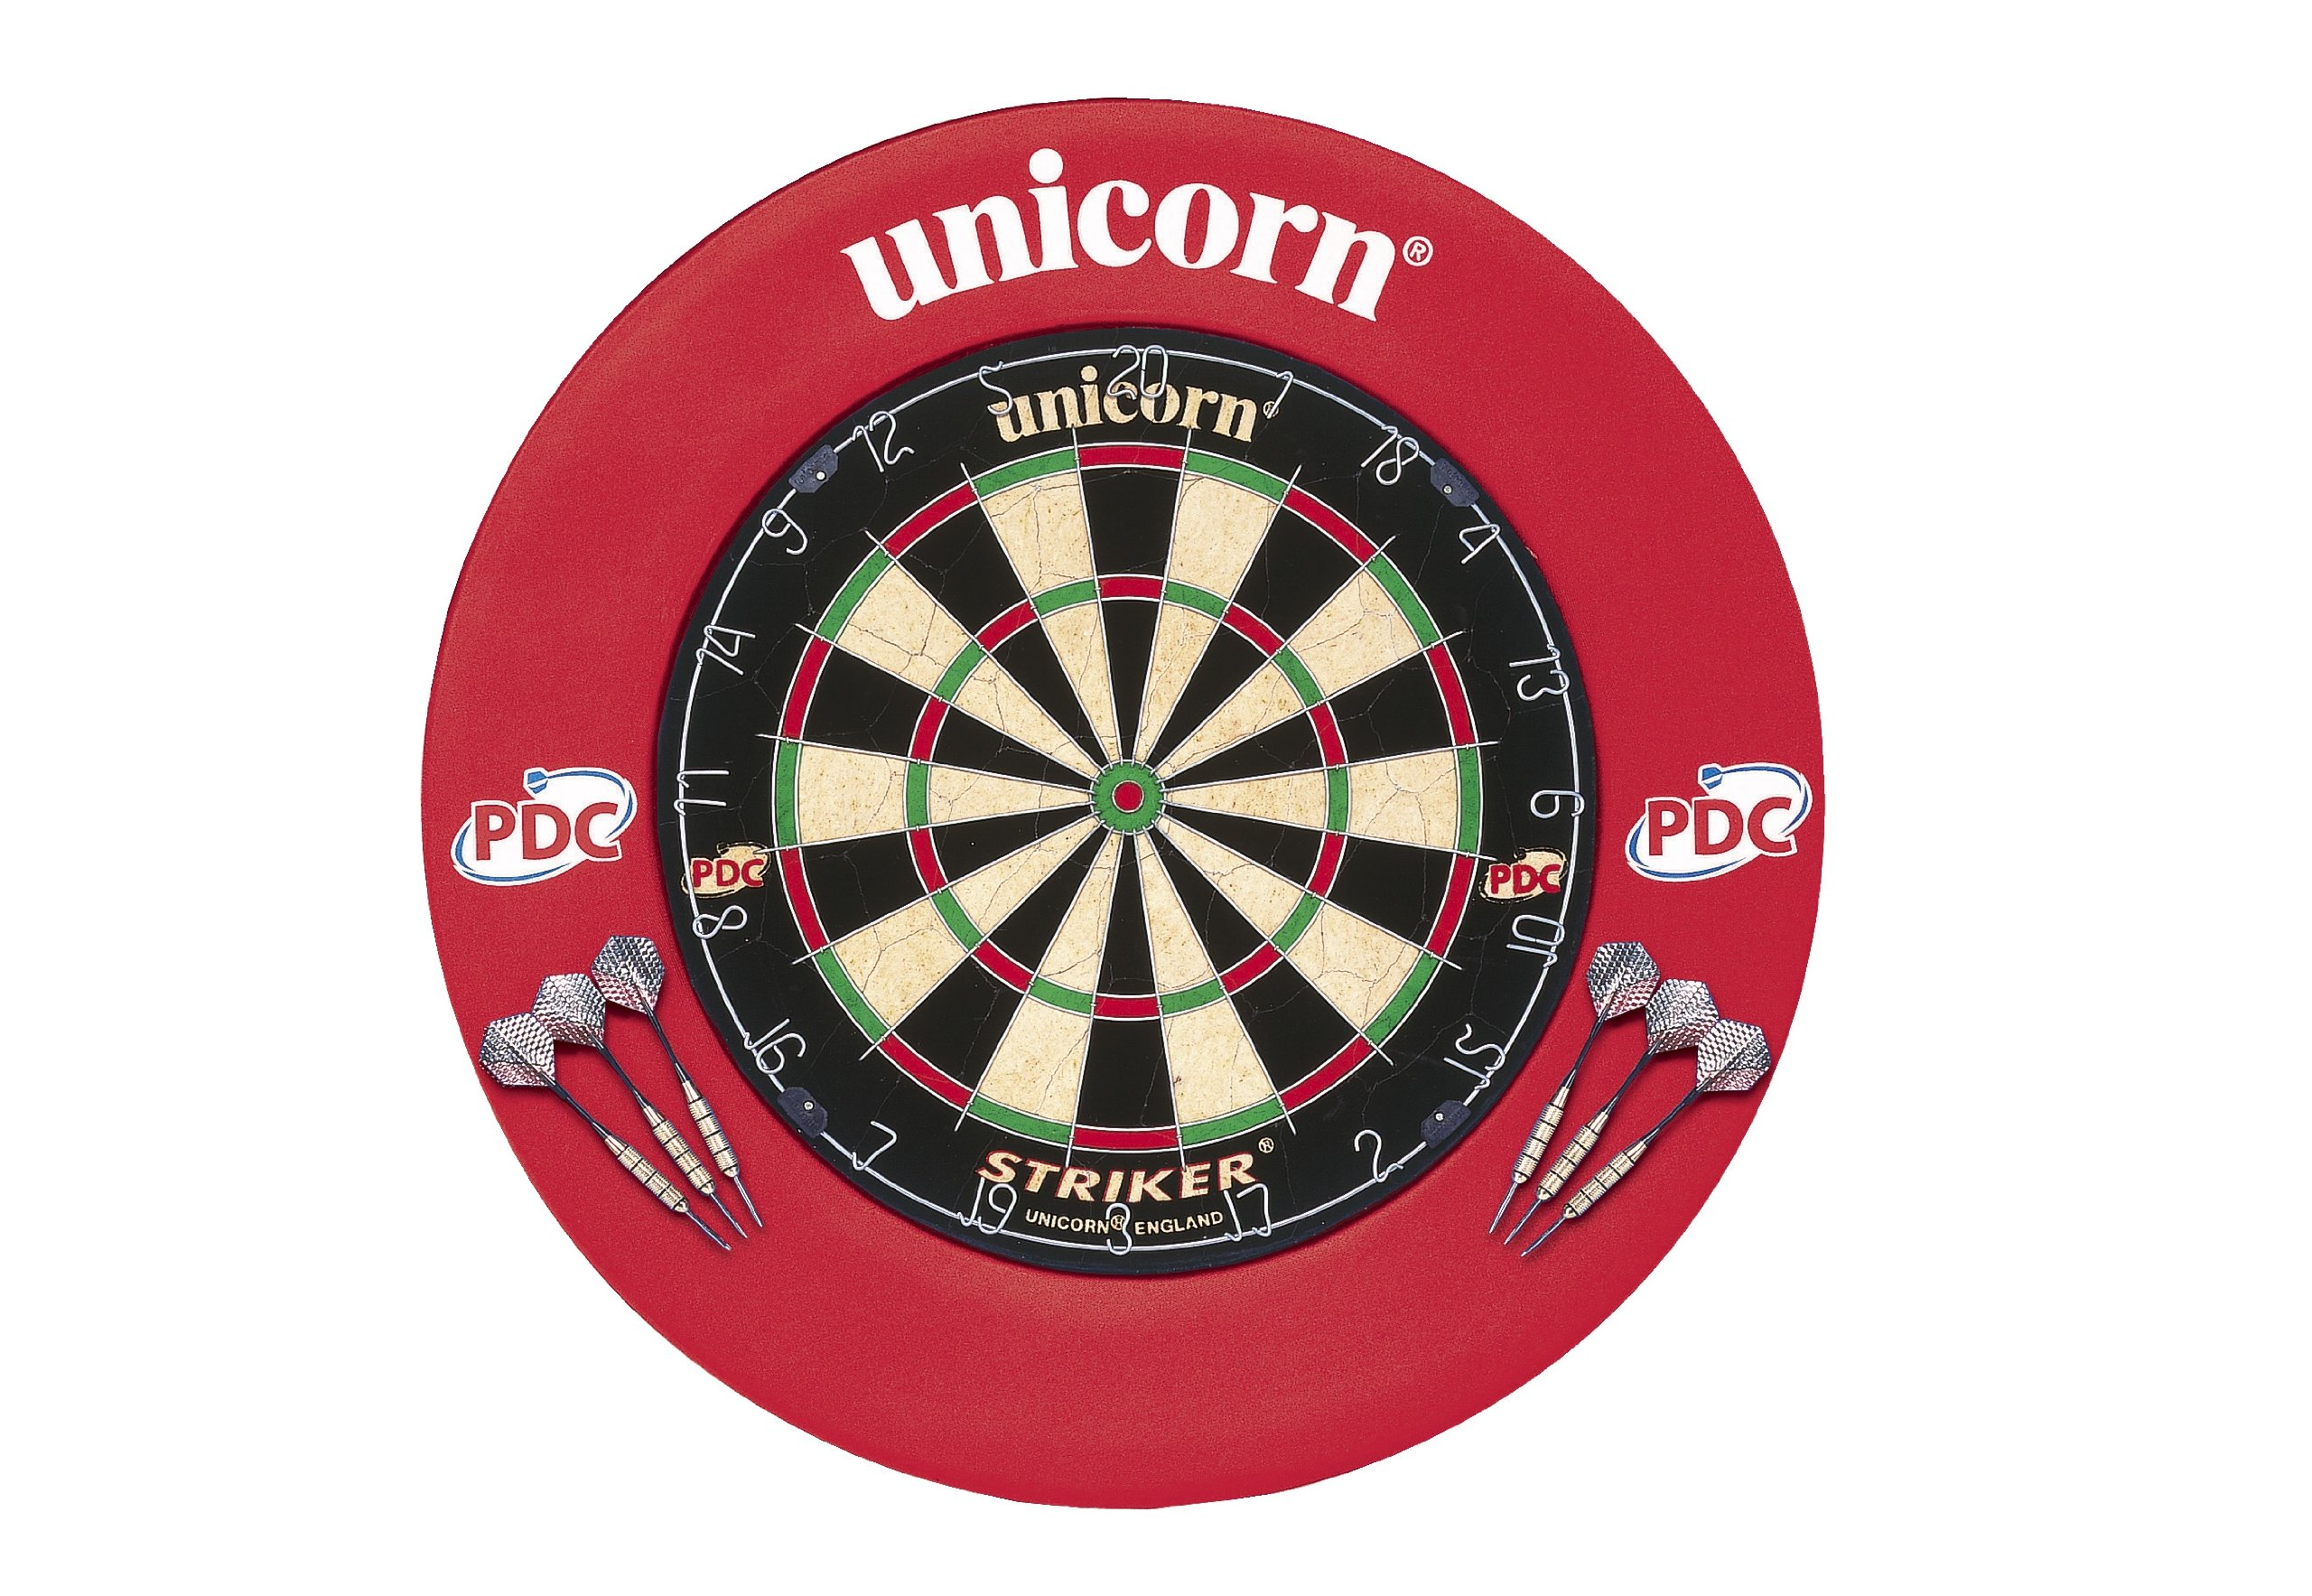 Unicorn STKER BRD & SRND Darts, Red, One Size